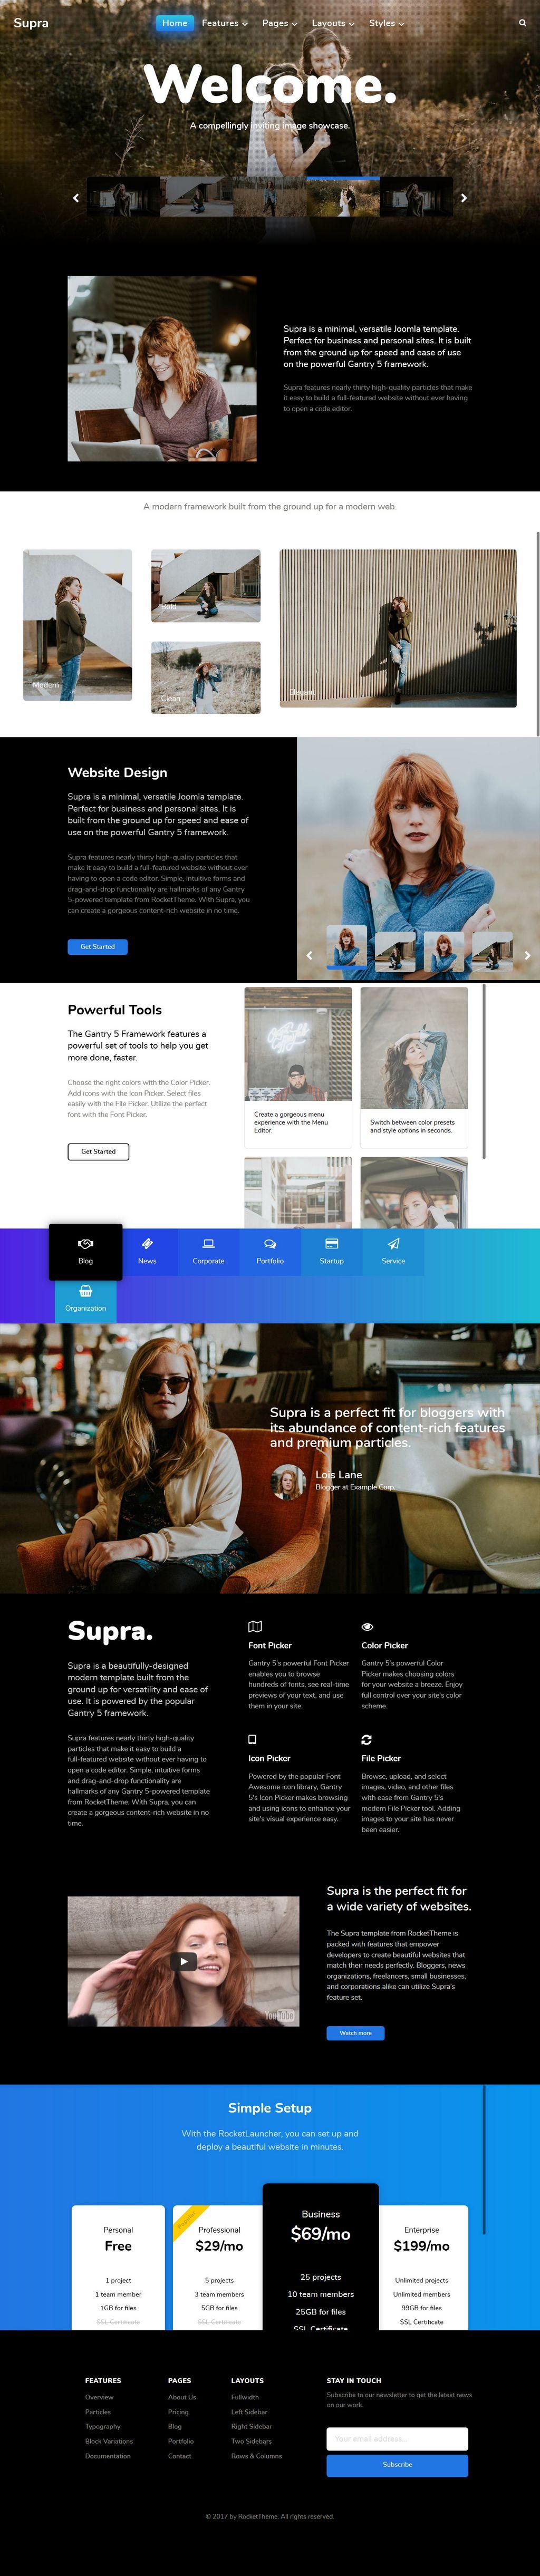 24 best Premium Joomla Themes images on Pinterest